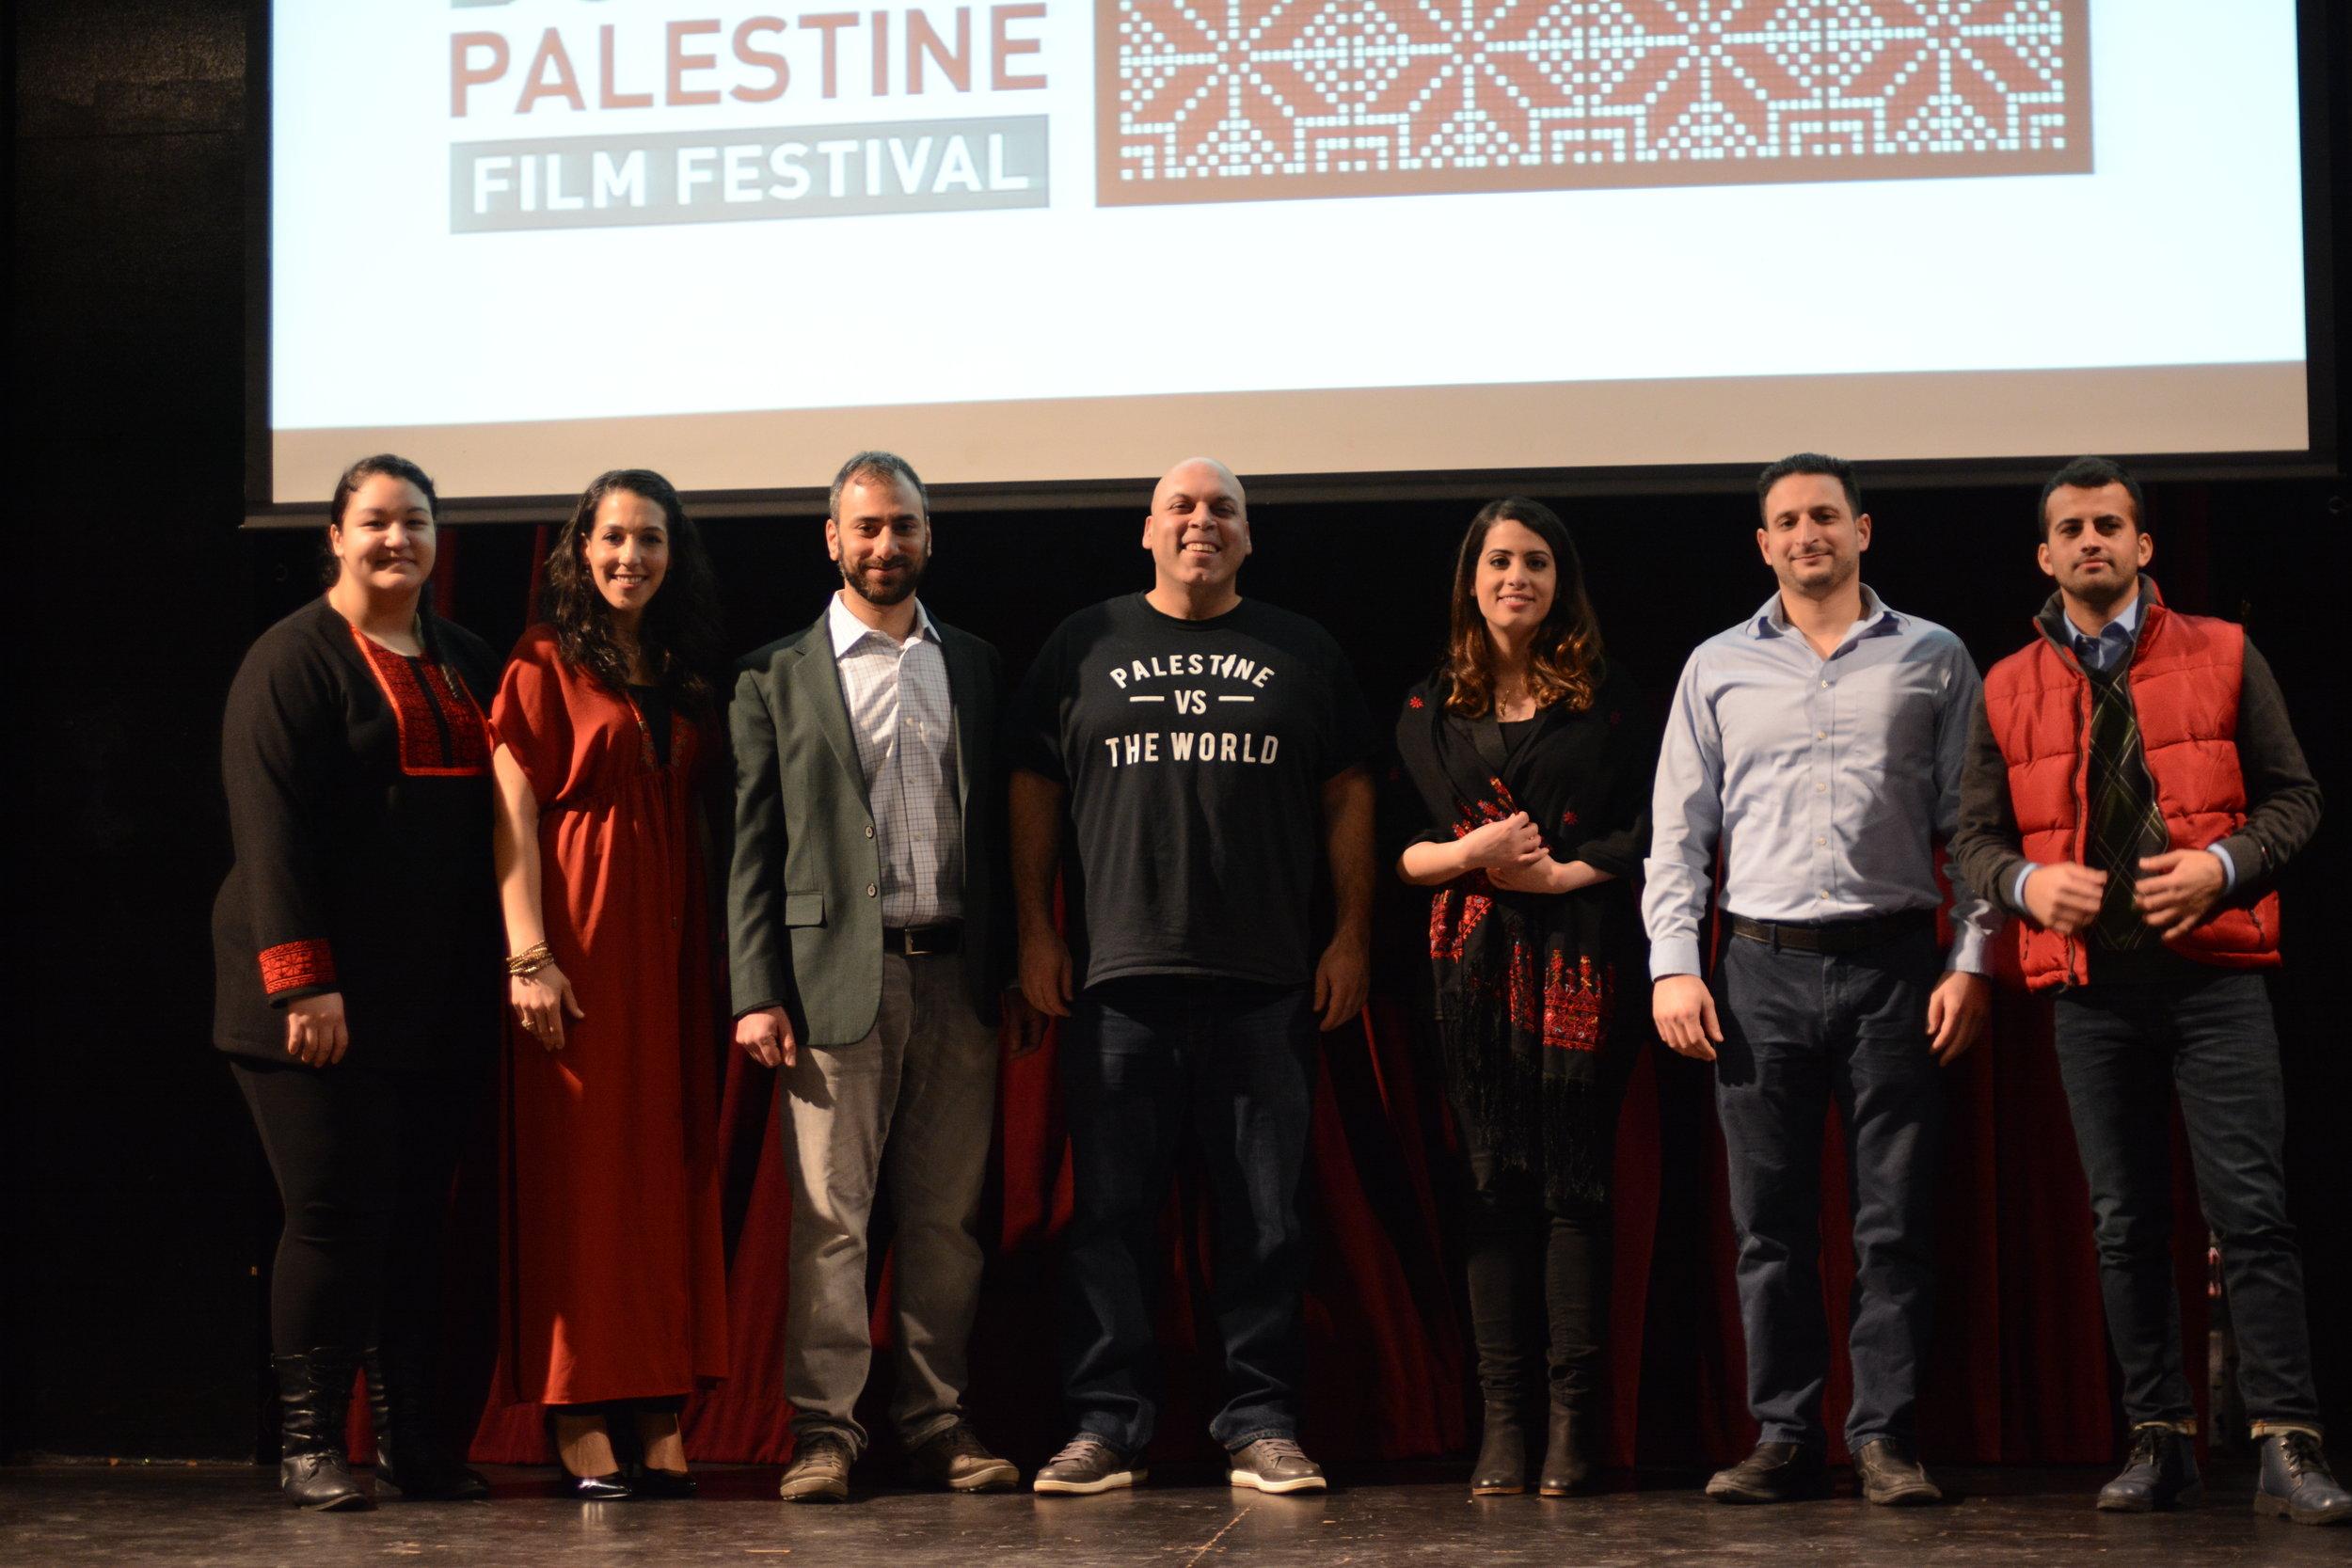 Palestinians, Live! BostonJanuary 28, 2018, Oberon TheaterIn collaboration with the Boston Palestine Film Festival. - Storytellers: Rain Abdelrazaq, Michael John Maria, Amer Zahr, Dalia Deak, Canaan David Khoury, Amir Qudaih and Nadia Abuelezam.